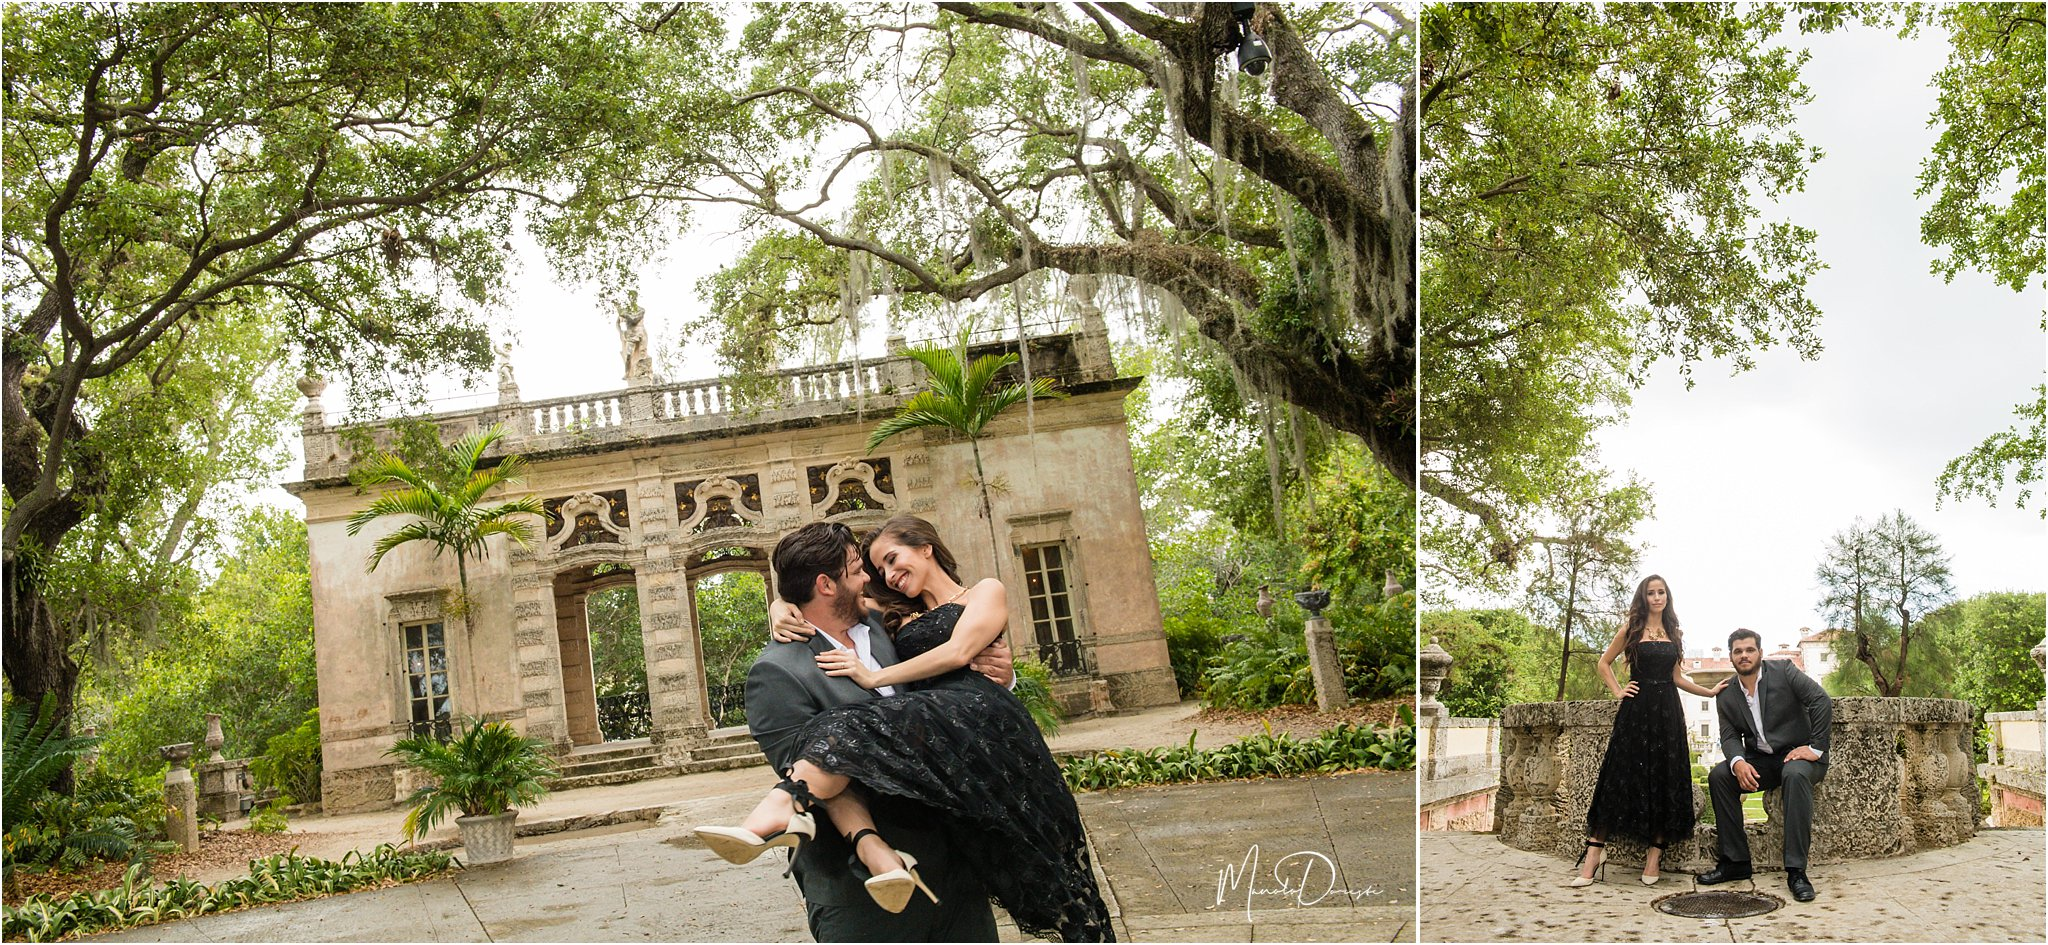 0593_ManoloDoreste_InFocusStudios_Wedding_Family_Photography_Miami_MiamiPhotographer.jpg